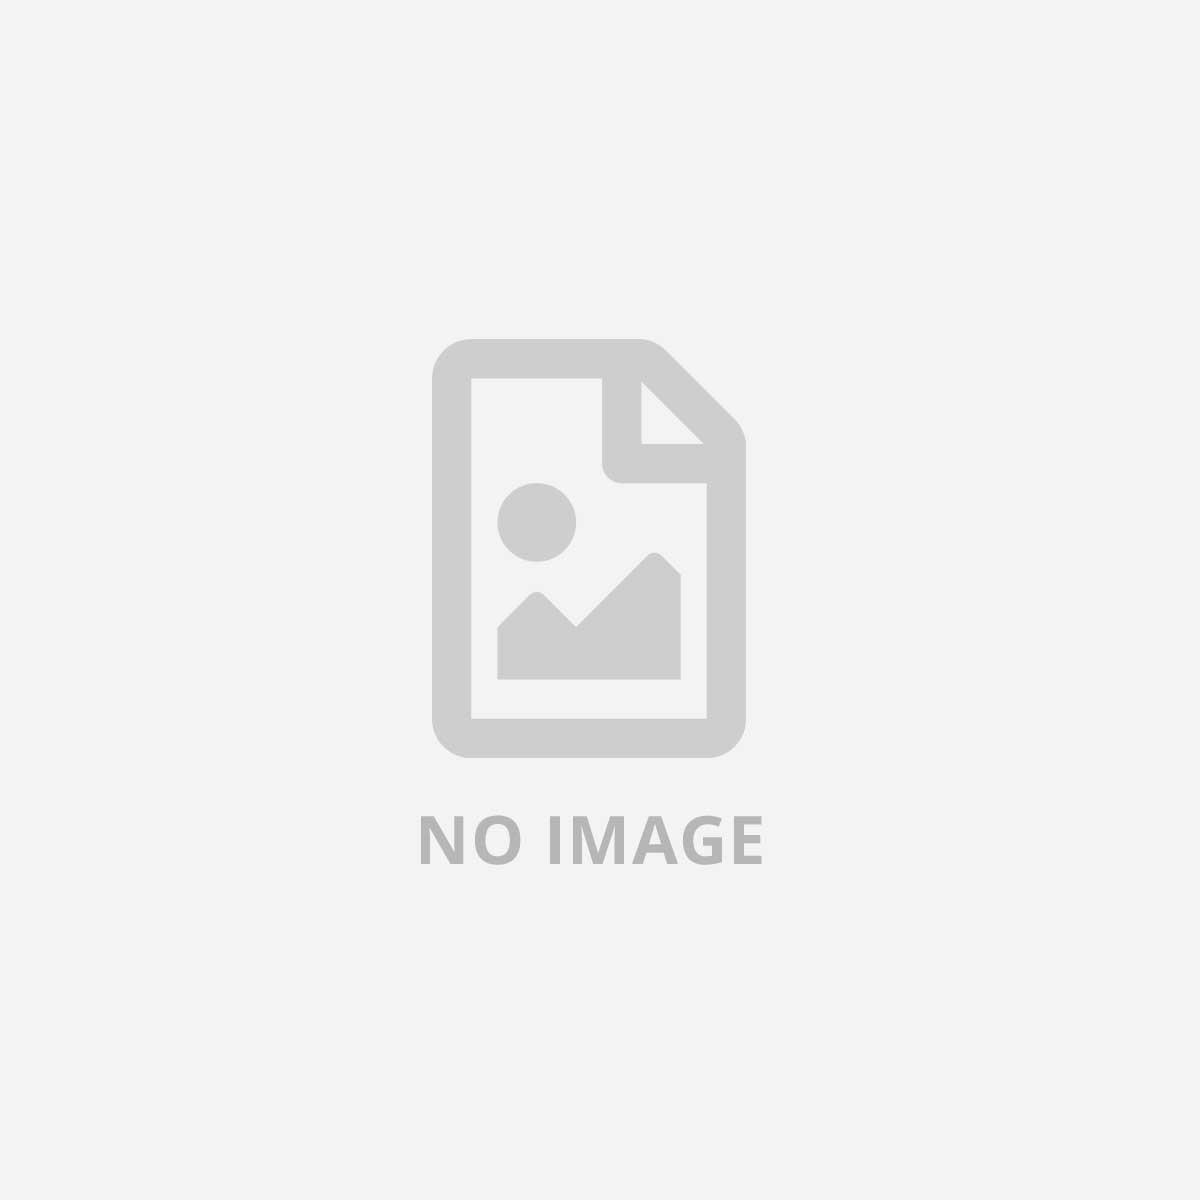 SAMSUNG GALAXY TAB S5E 10.5 LTE BLACK